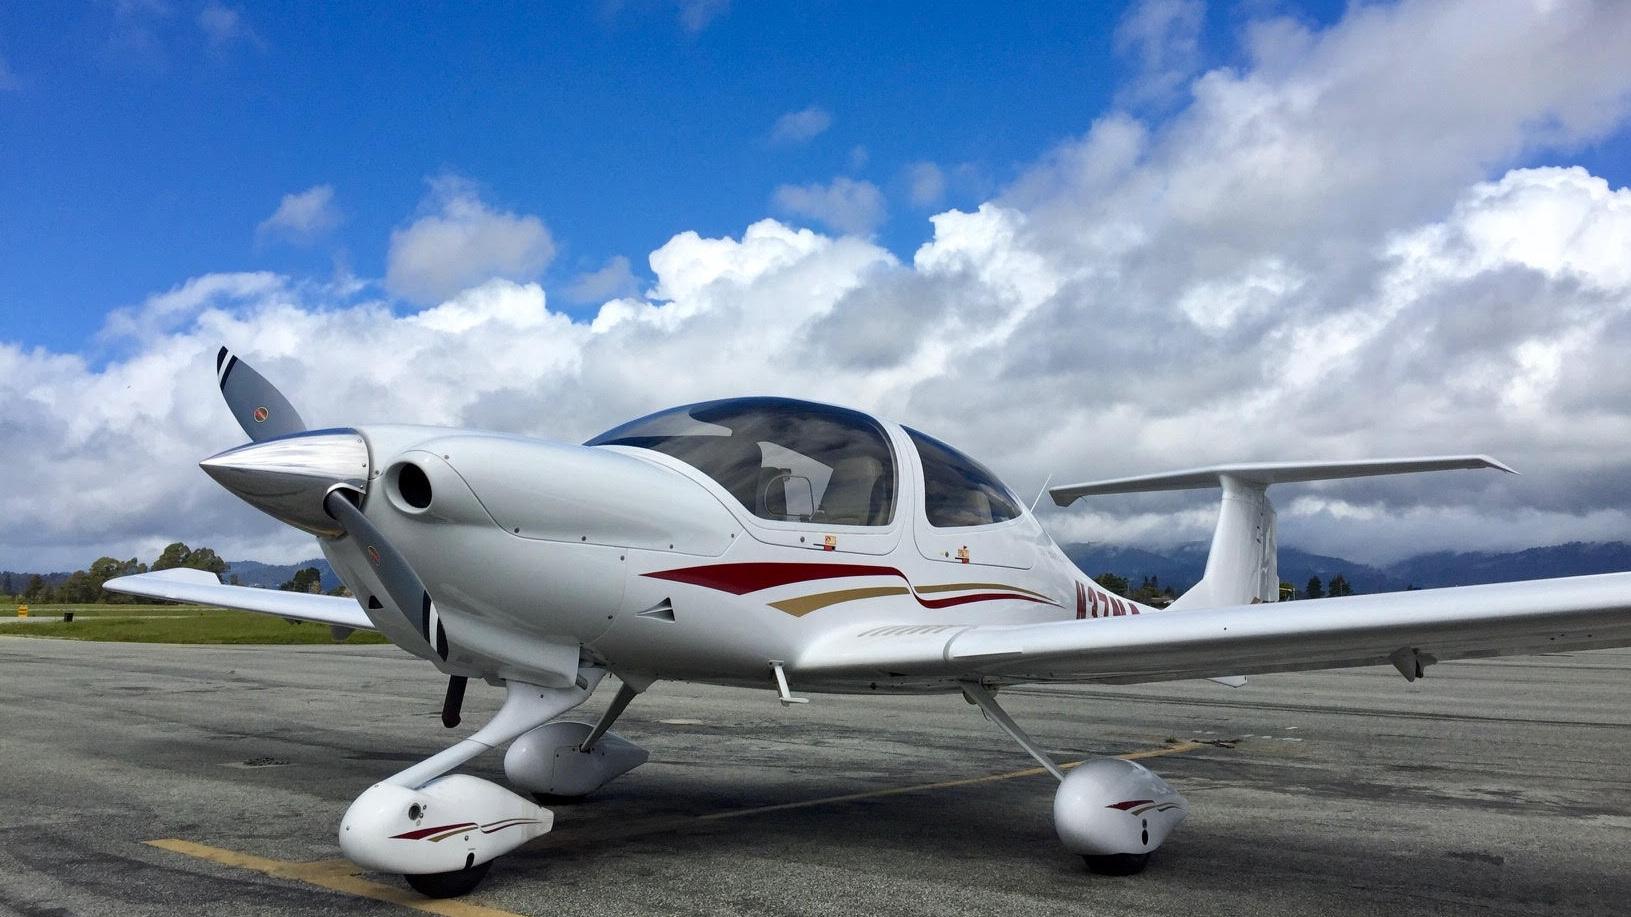 N37NA - DA40  G1000 WAAS, Autopilot, 140 kts cruise.  $165 Hr.   Checkout Exam   POH- Download